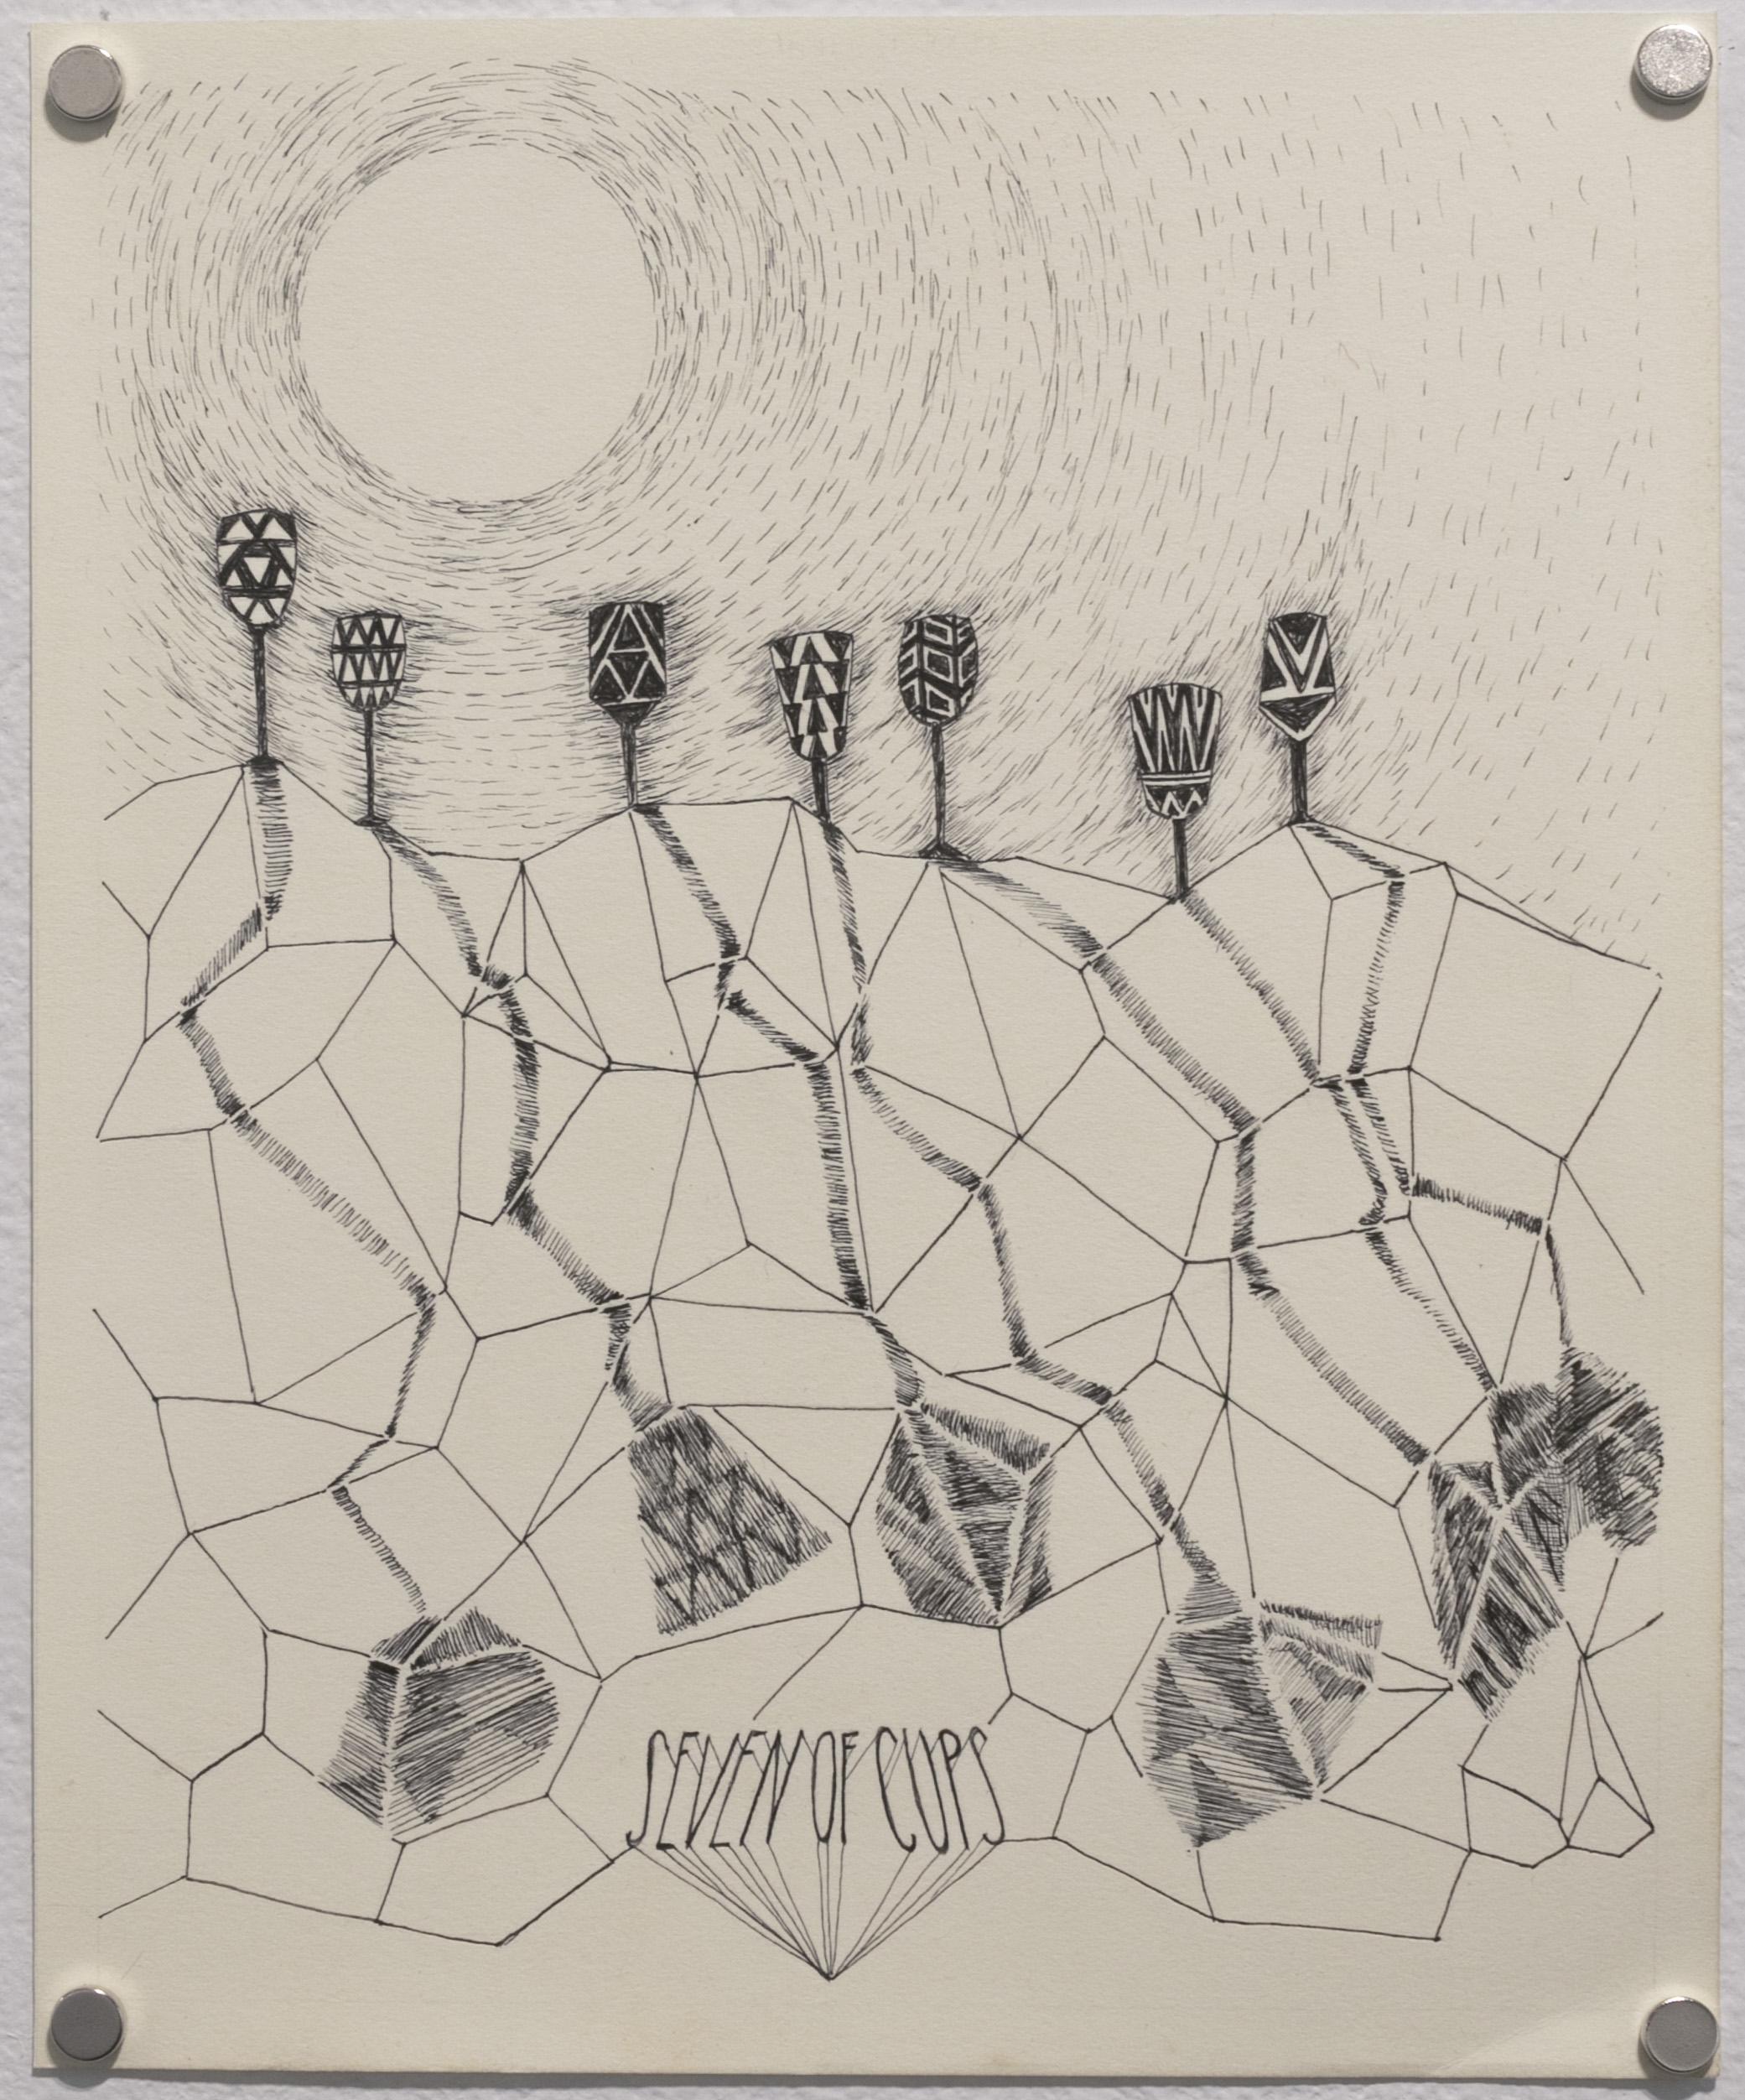 Seven of Cups (Black Moon Tarot)